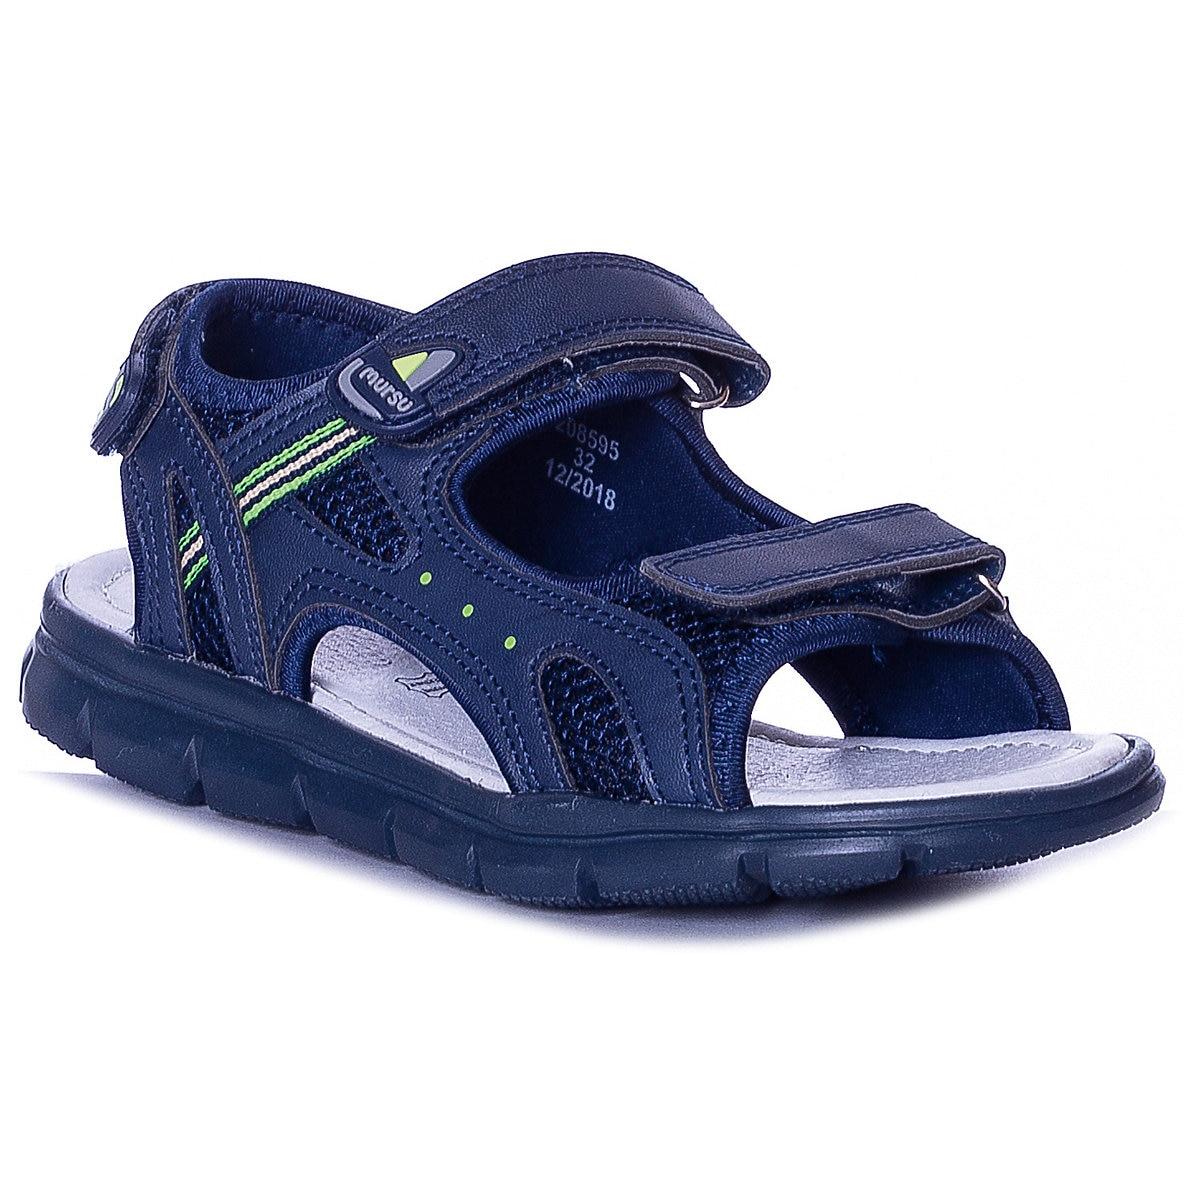 MURSU Sandals 10611931 children\'s shoes comfortable and light girls and boys MTpromo kakadu sandals 10696136 clogs comfortable and light children s shoes girls and boys